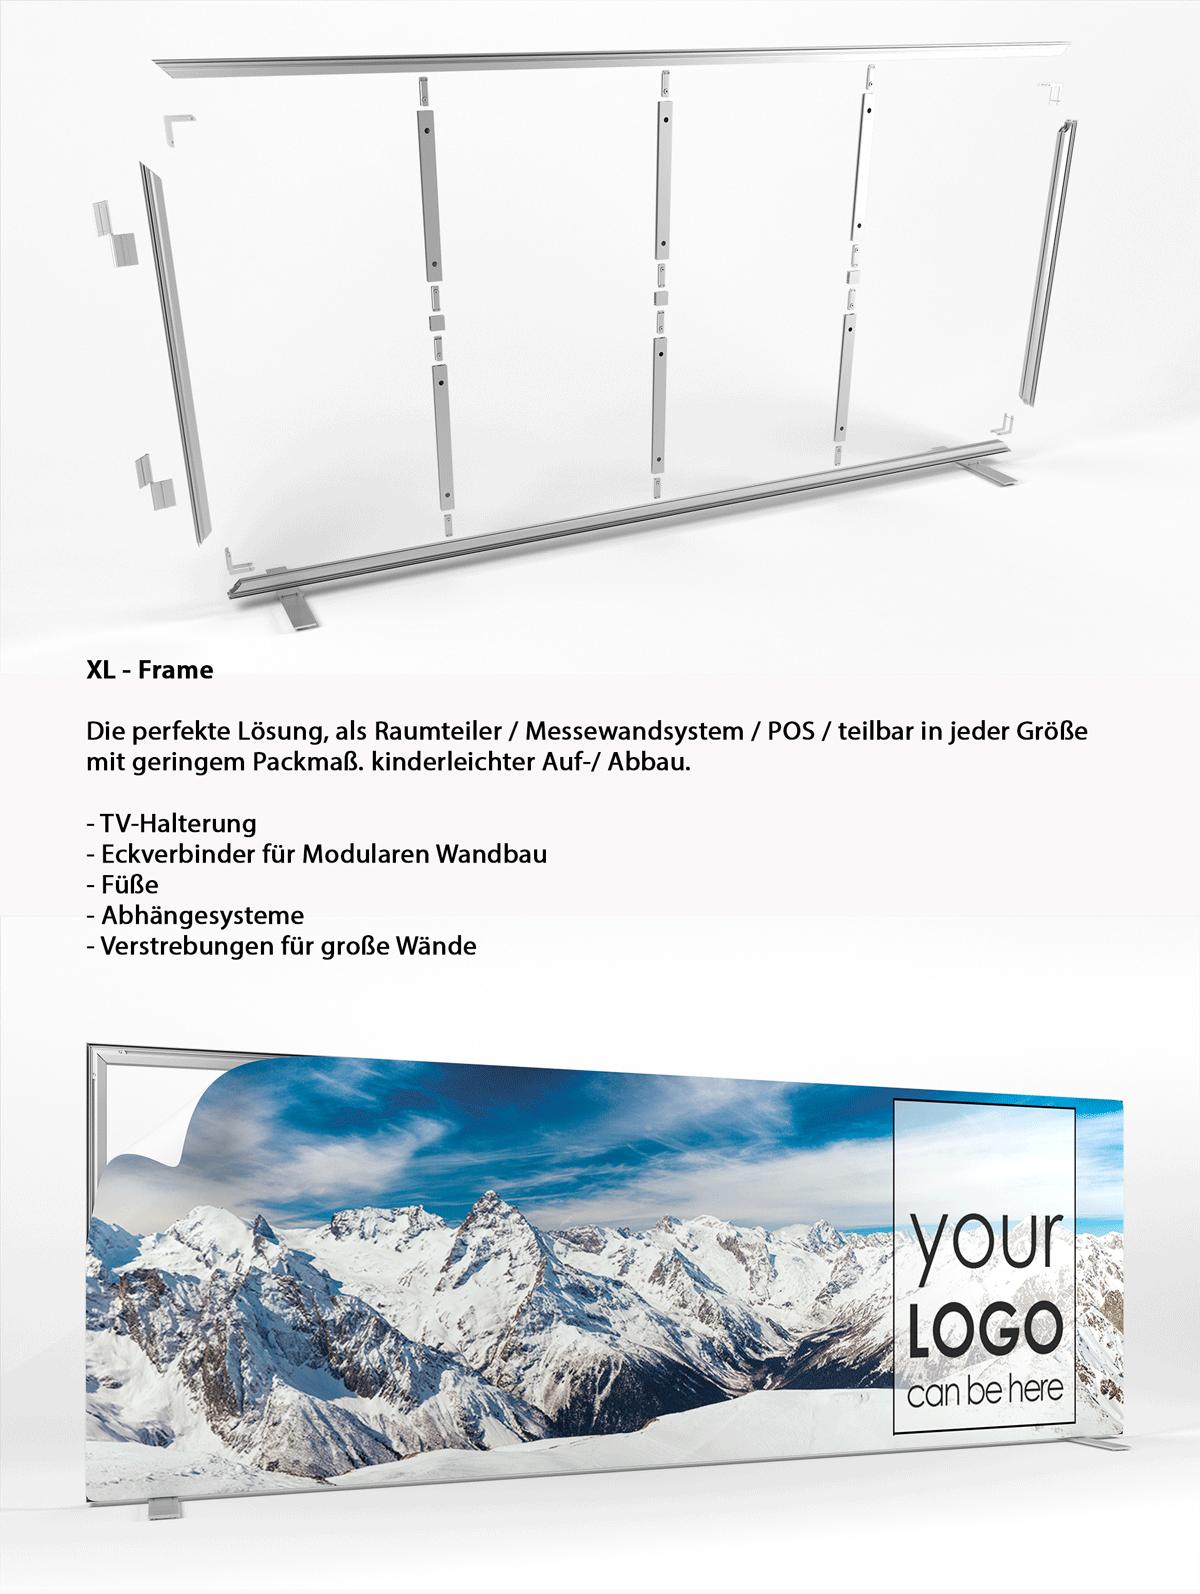 XL-Frame-Produktmaster_1200xpx